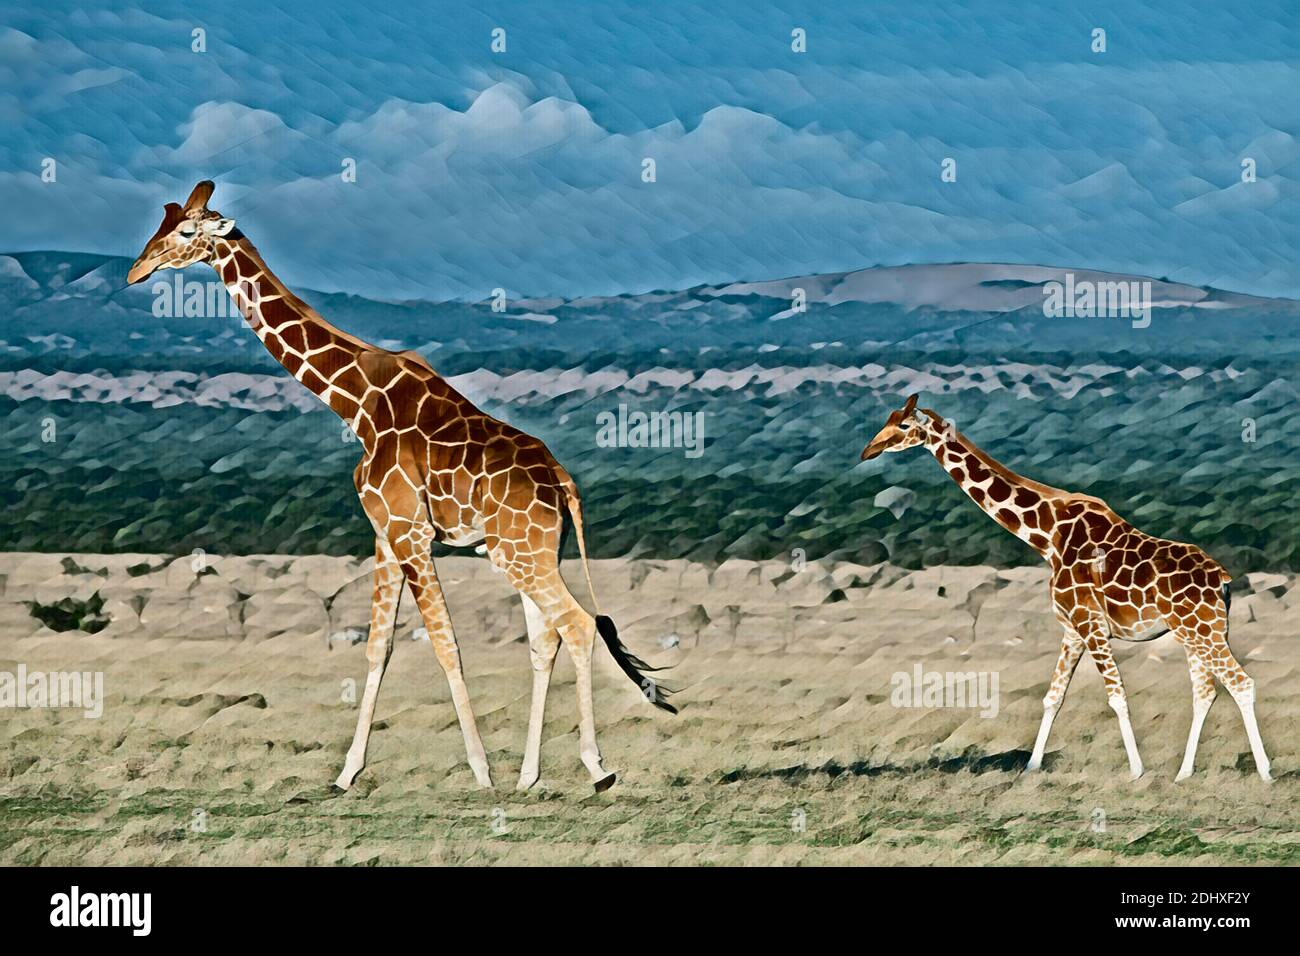 África, Kenia, jirafas reticuladas (SALVAJE: Giraffa camelopardalis reticulata) mejorado por computadora. Foto de stock